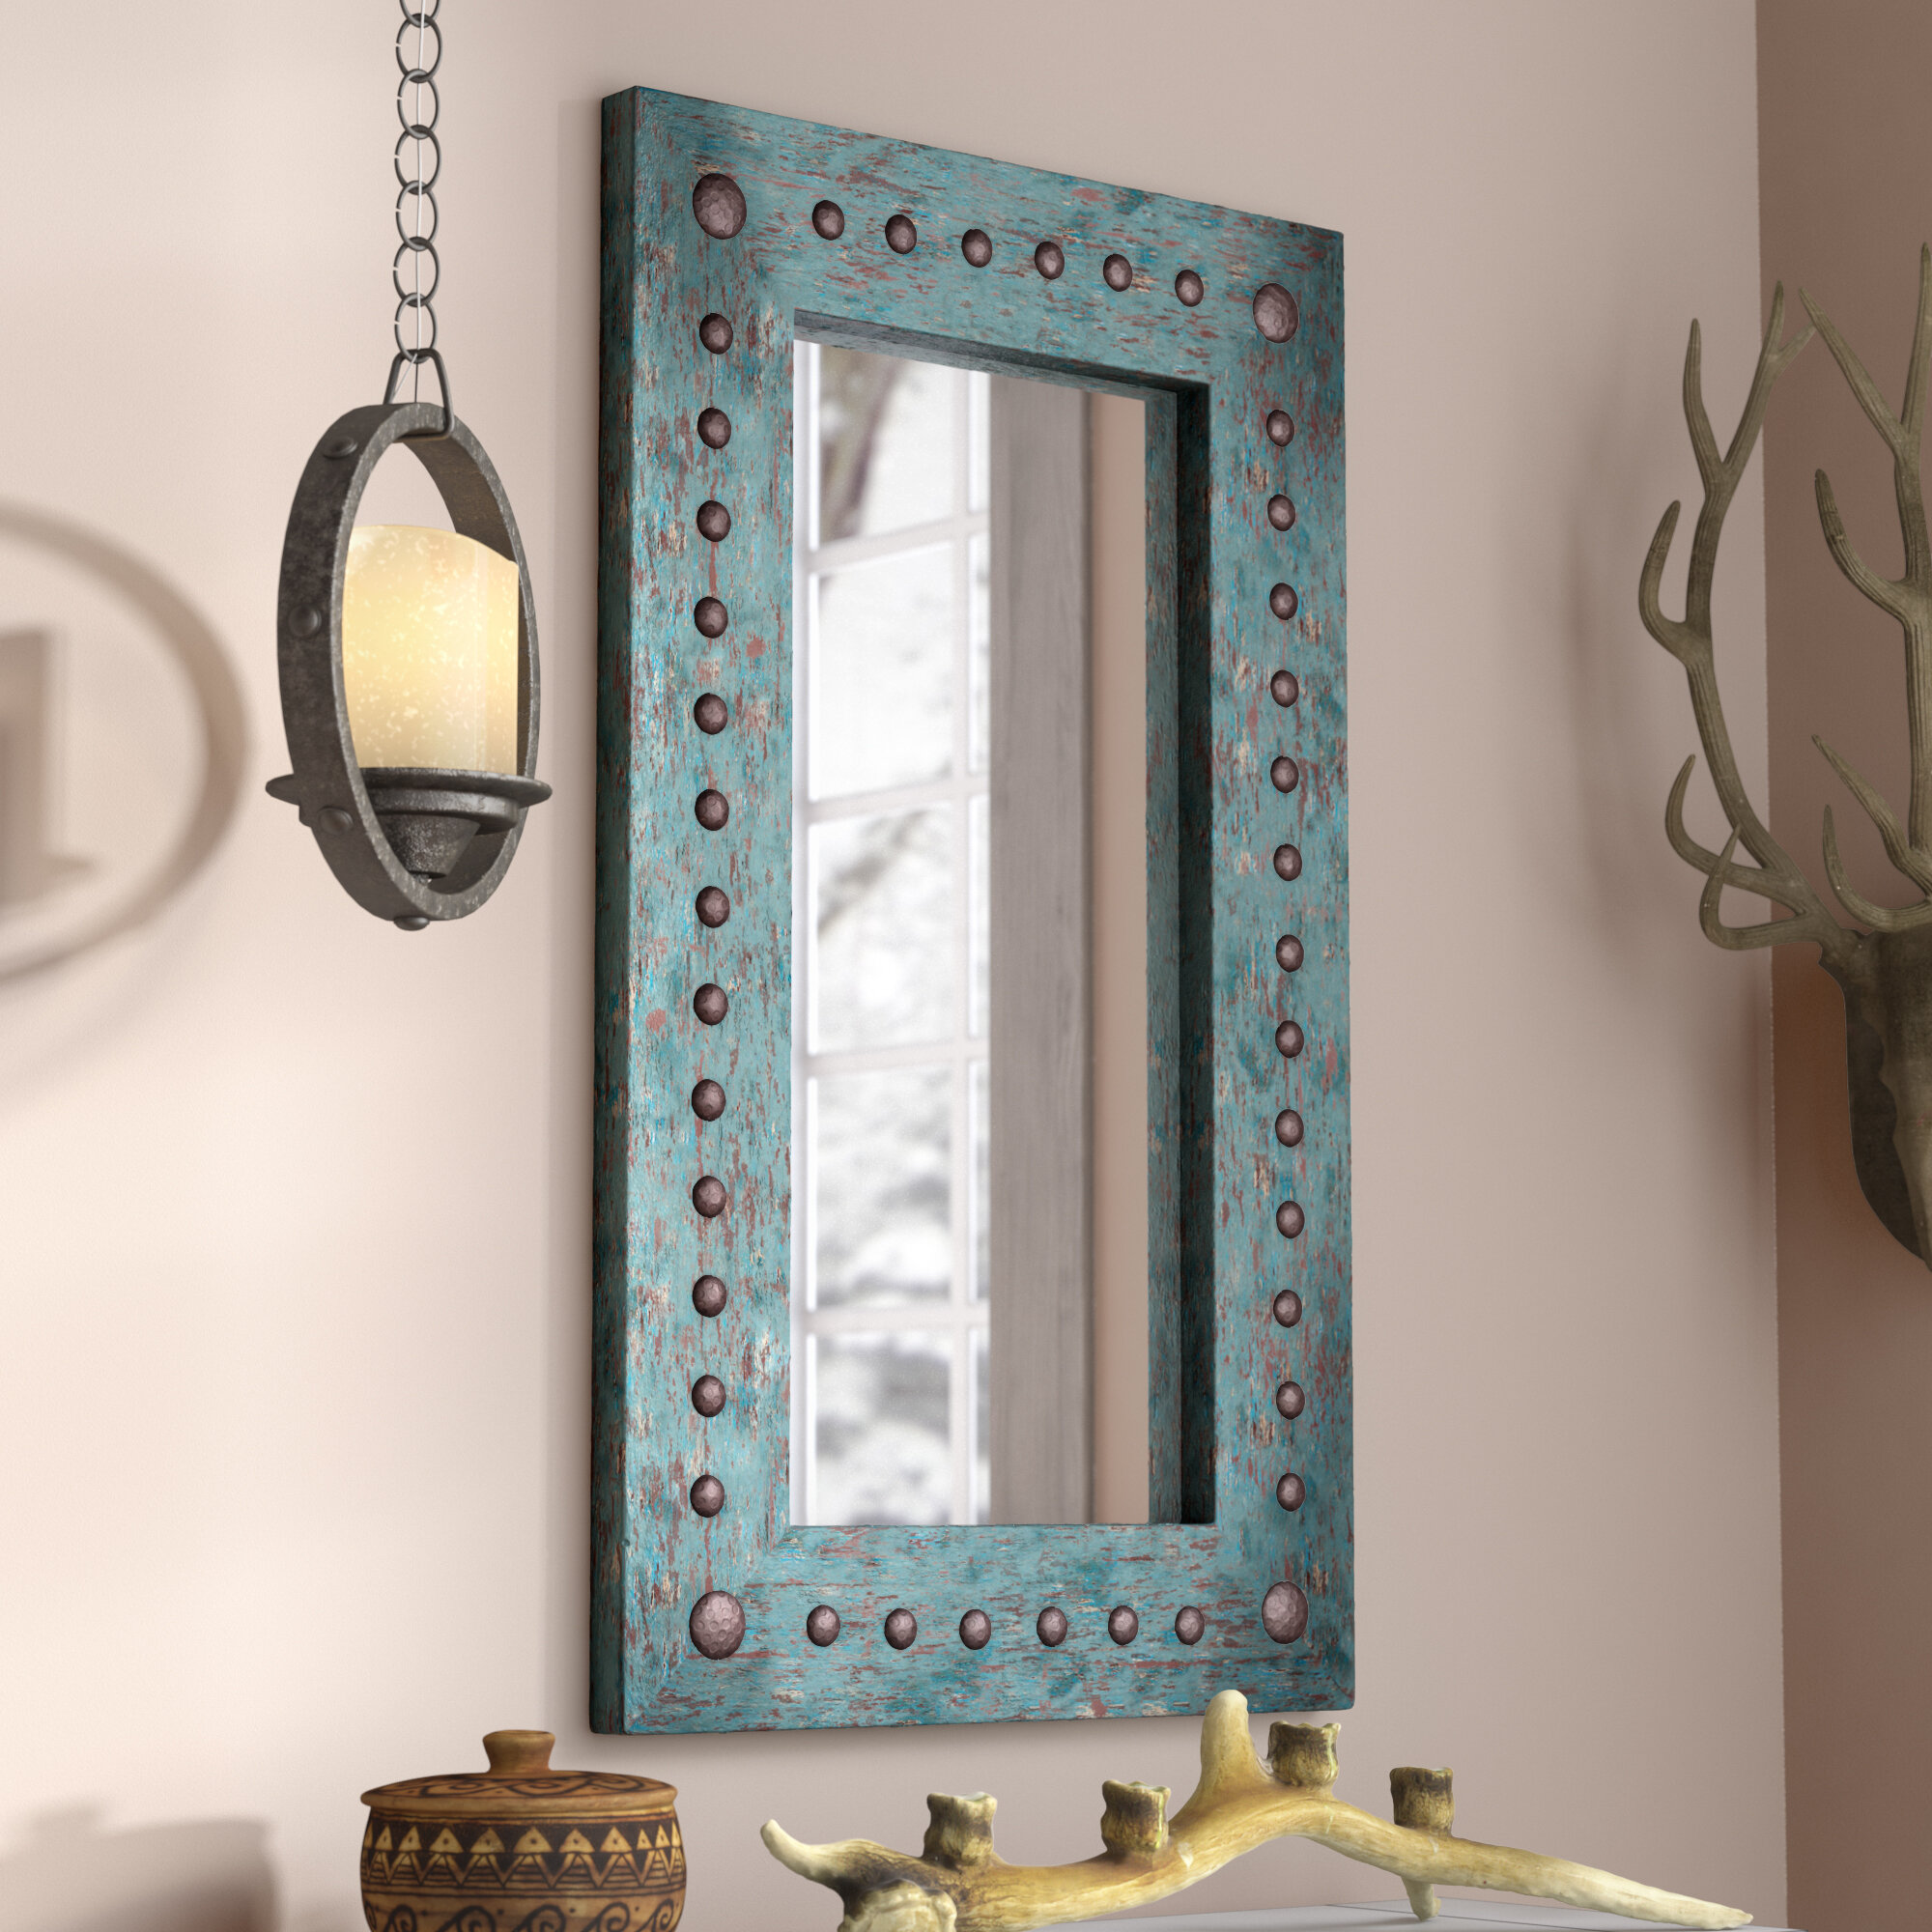 Bathroom Vanity Cottage Country Mirrors You Ll Love In 2021 Wayfair